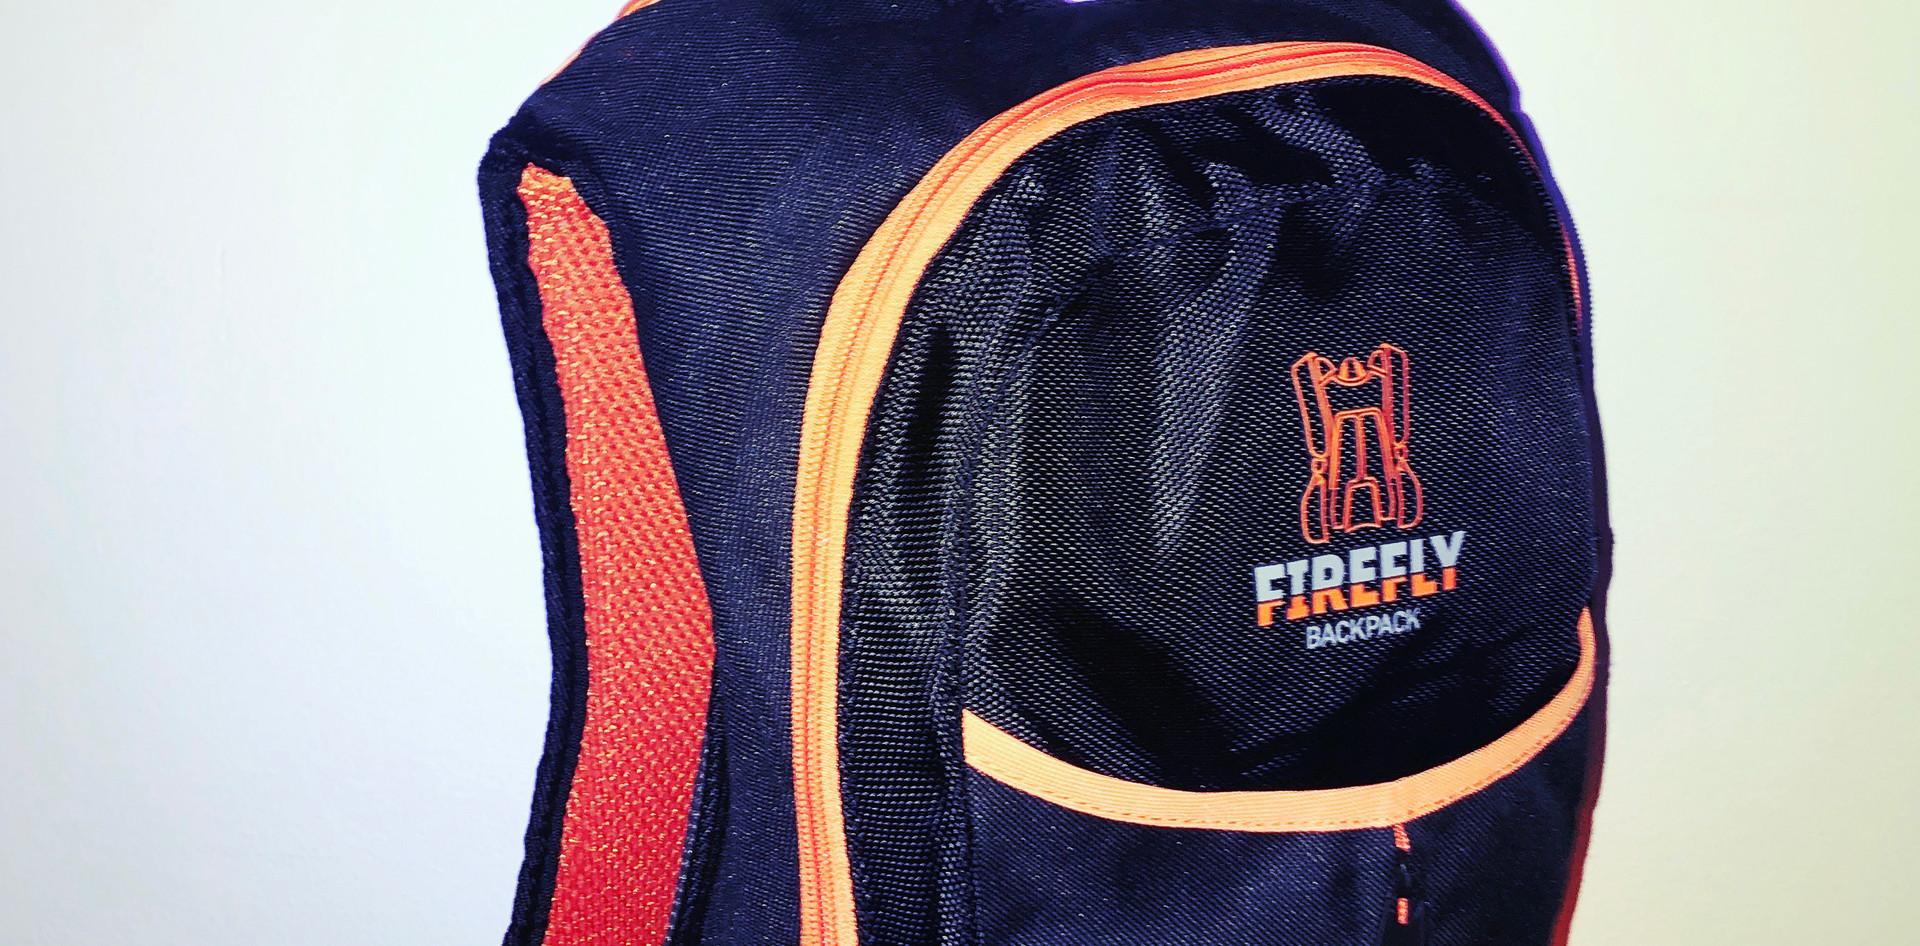 fireflyhalvsida2.jpg